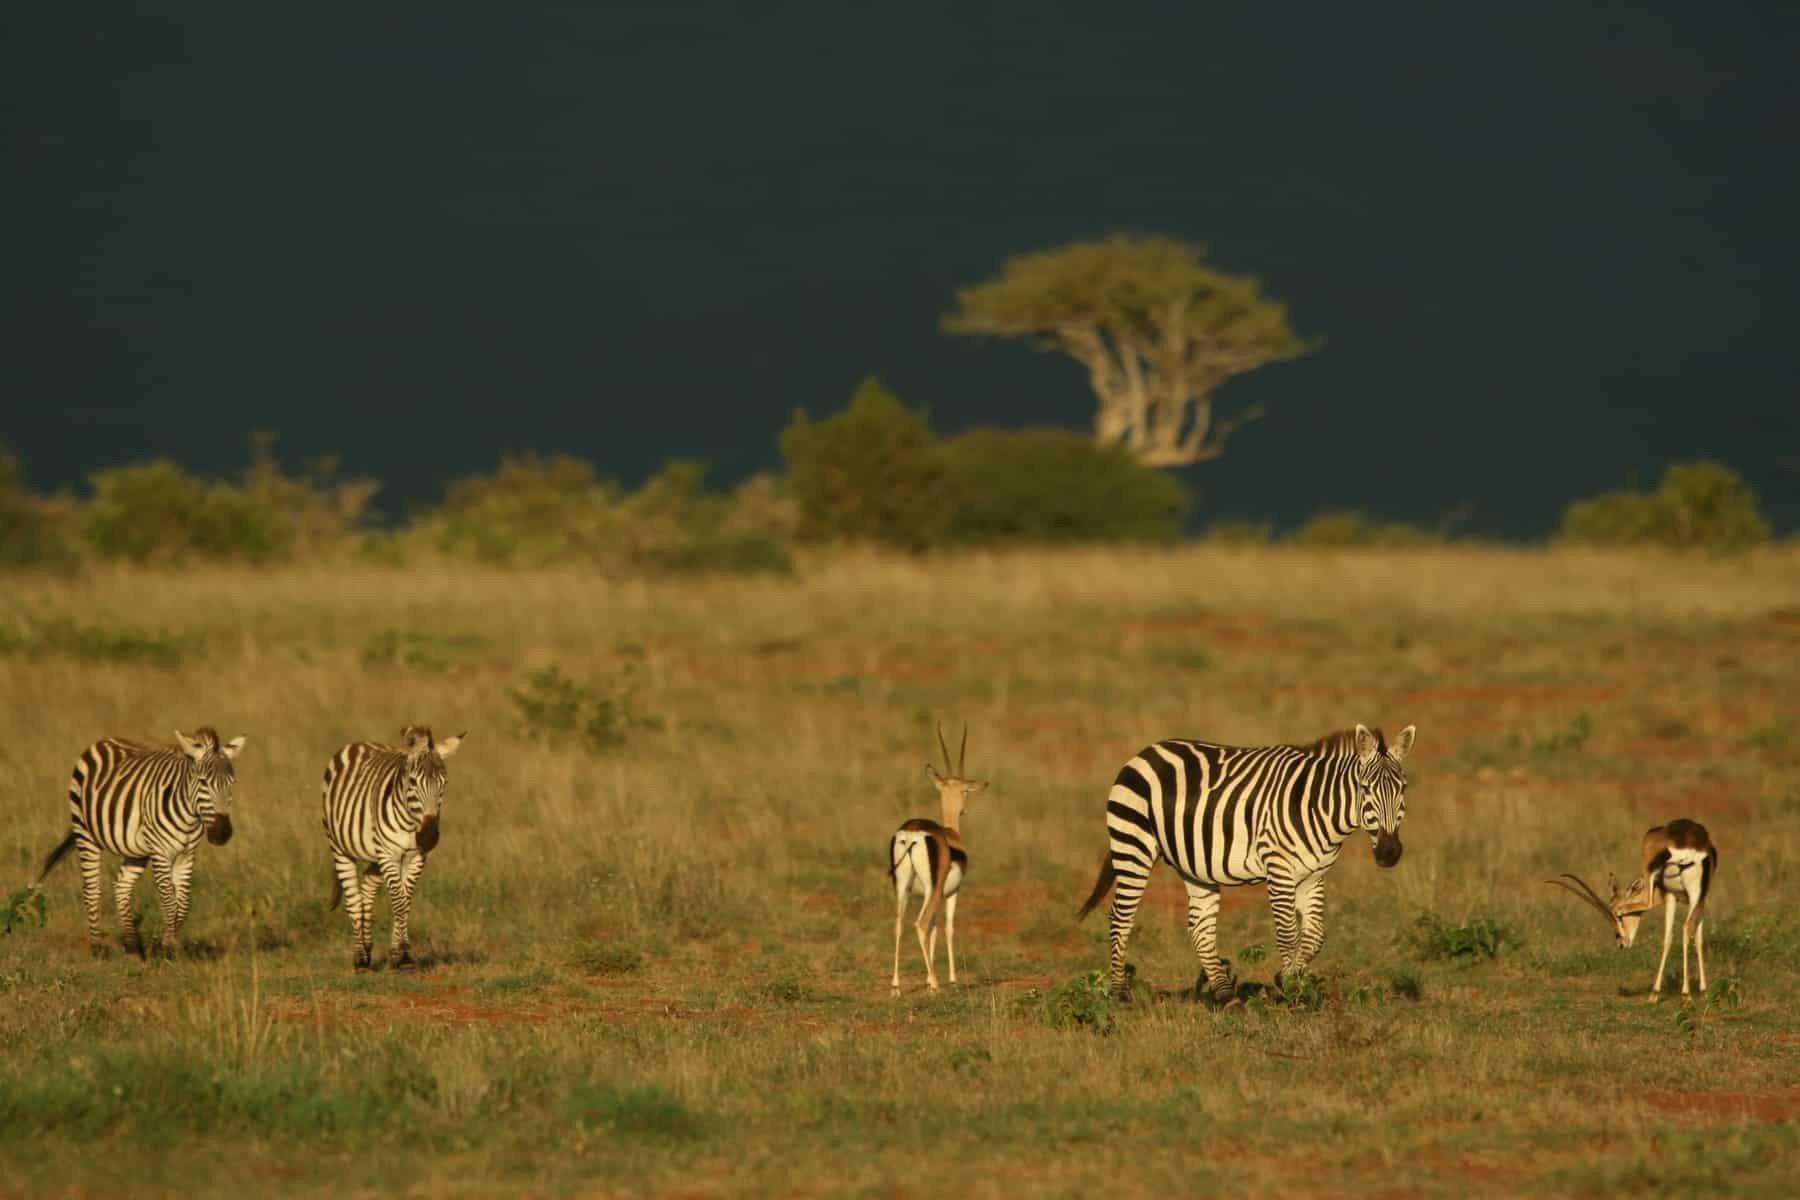 African safari. Plains zebra (Equus quagga) and Grant's gazelle (Nanger granti), Mpala Research Center, Laikipia, Kenya